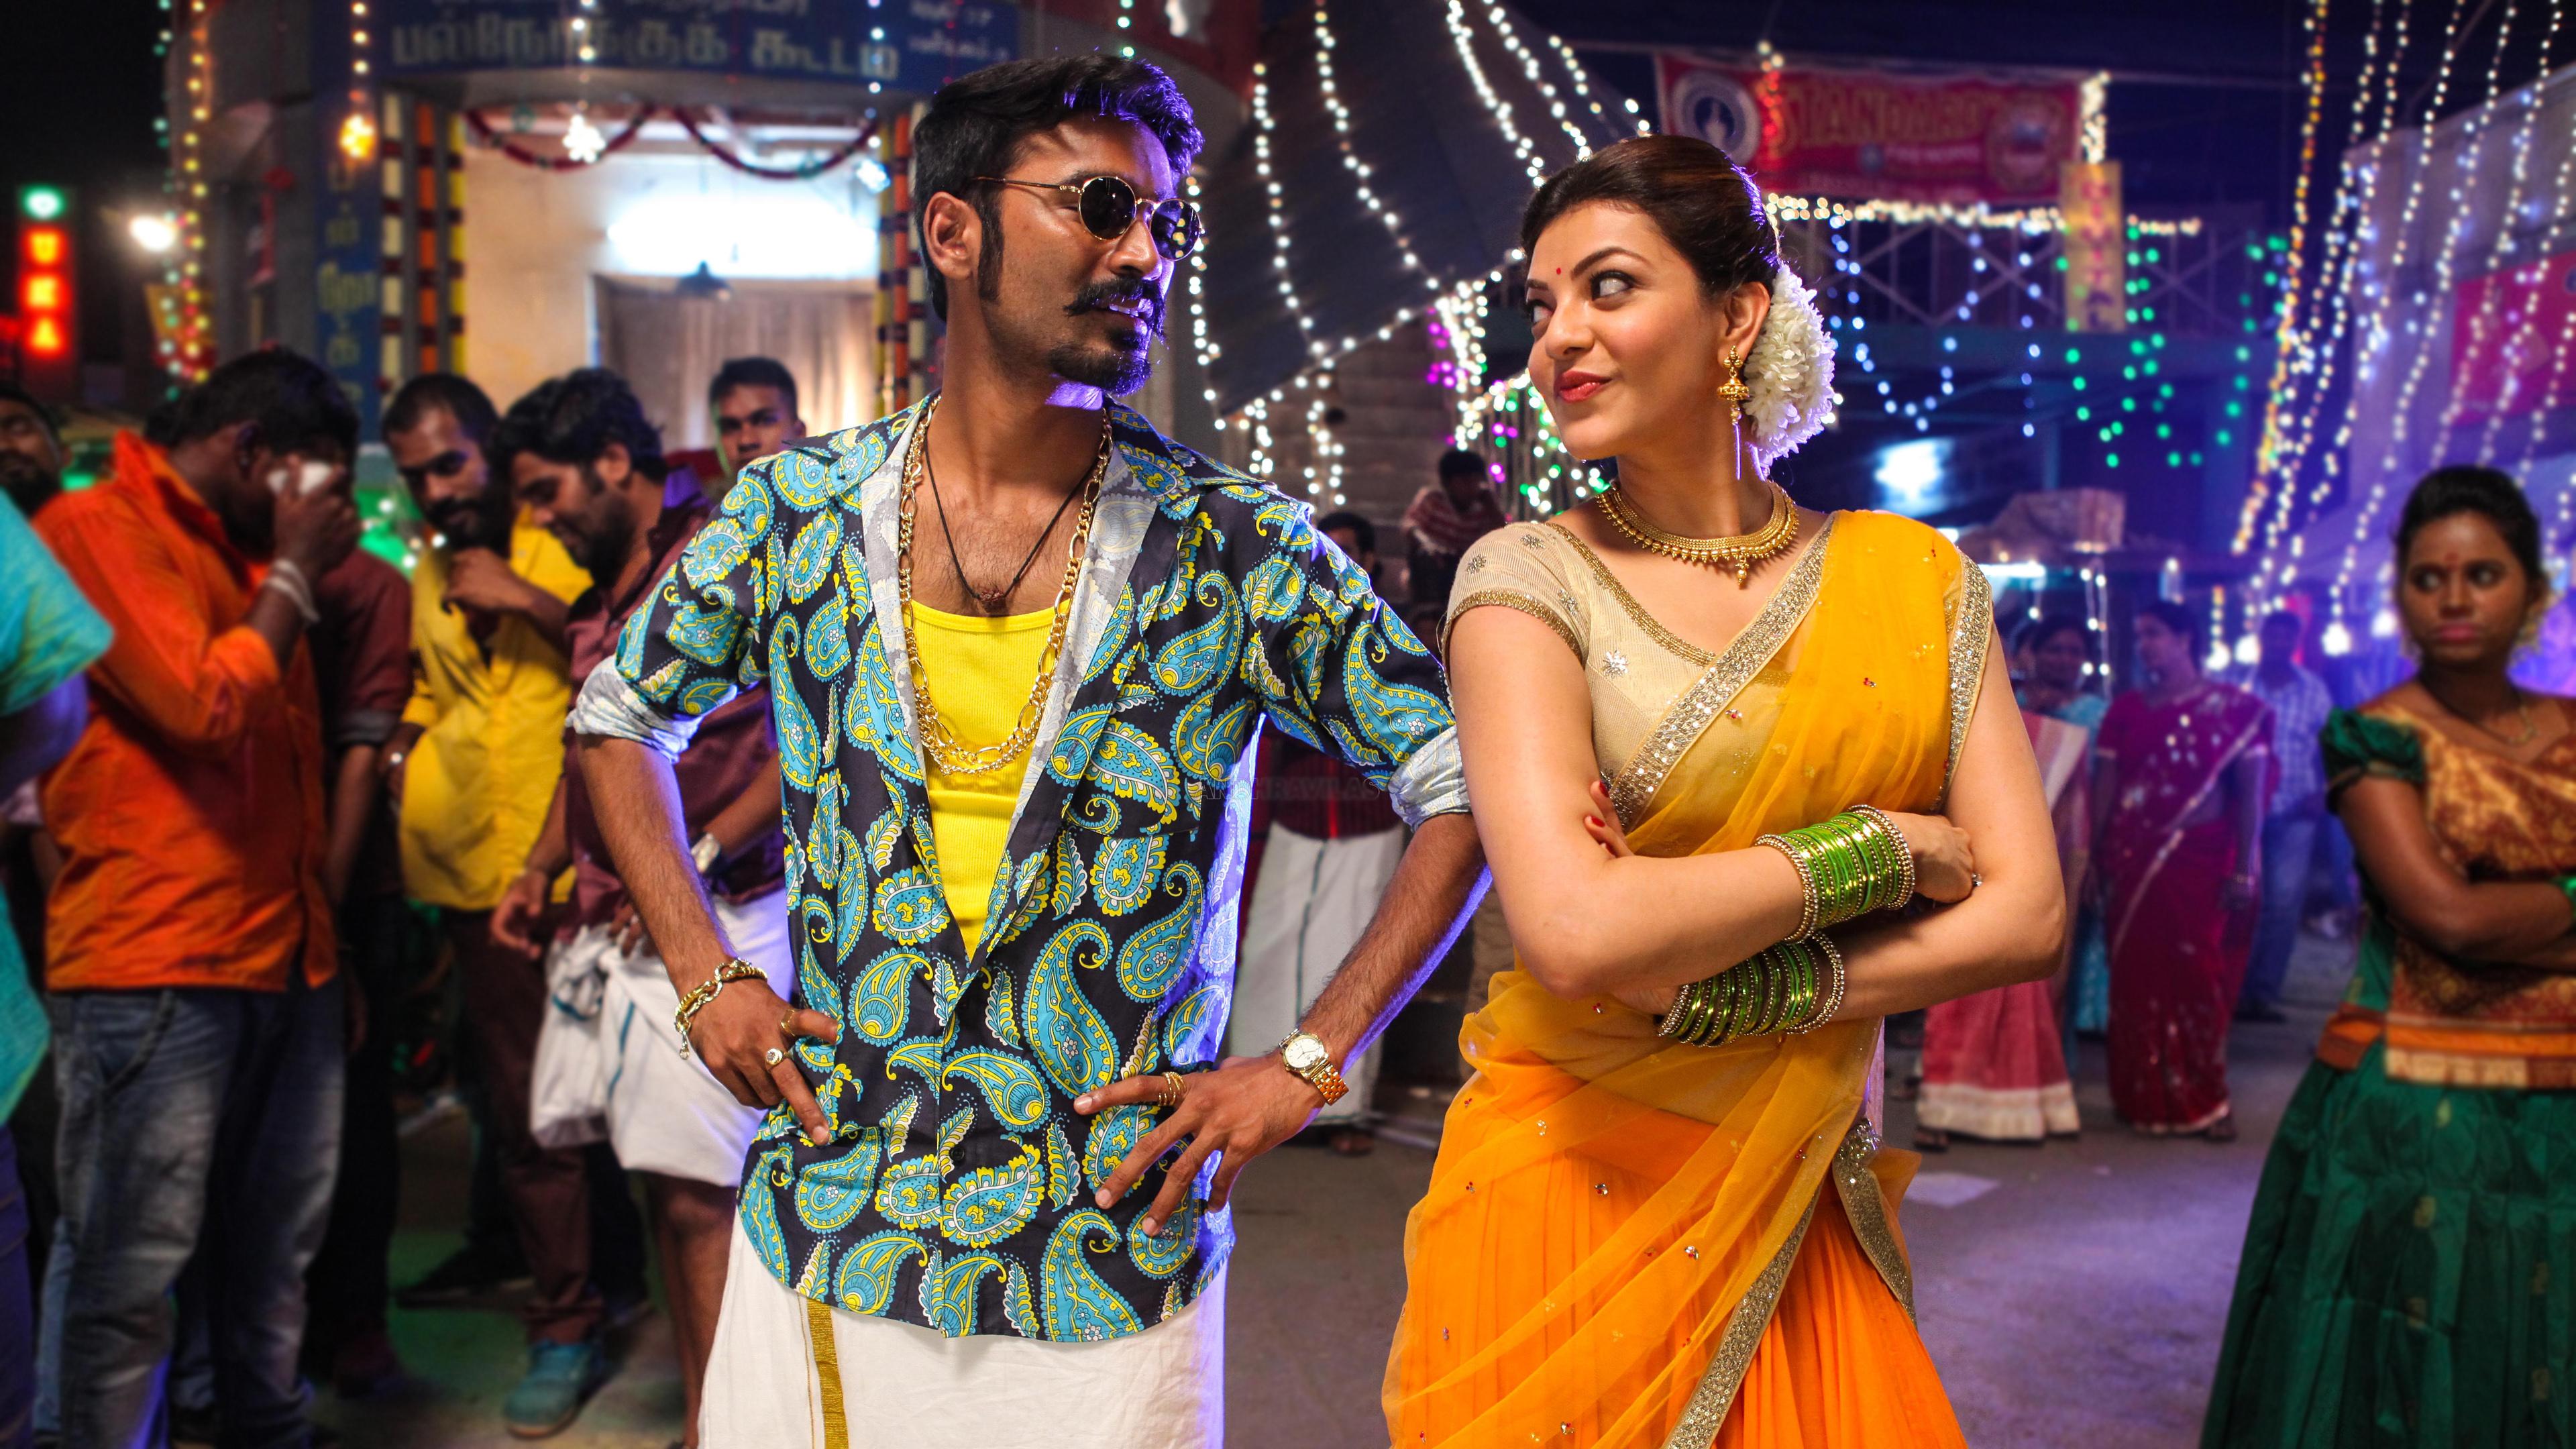 Vijay 3d Hd Wallpapers Dhanush Kajal Maari Tamil Movie Wallpapers Hd Wallpapers